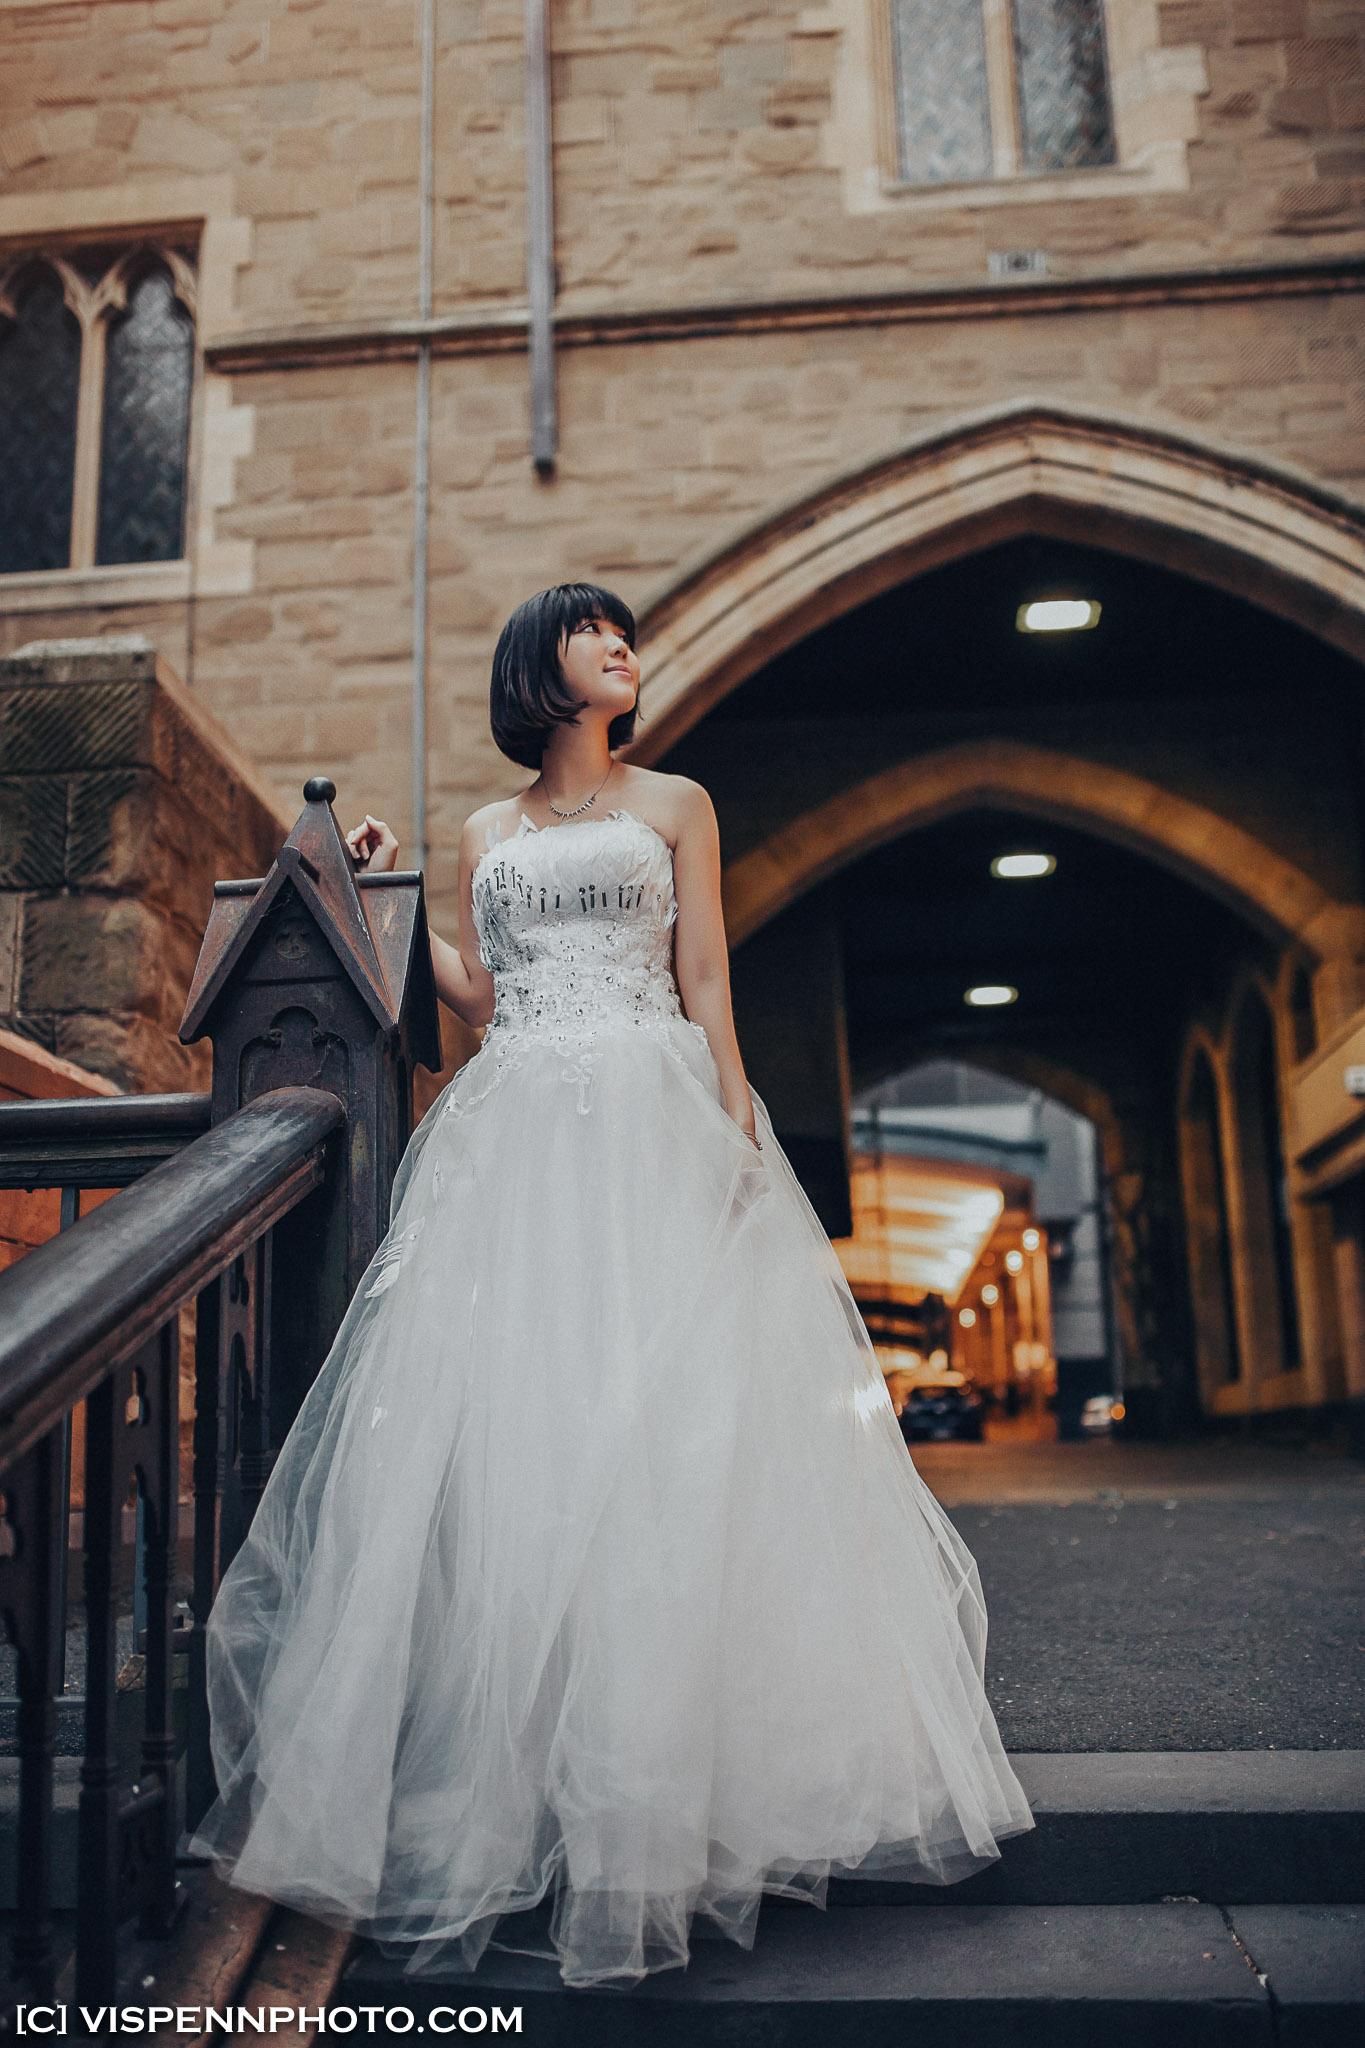 PRE WEDDING Photography Melbourne VISPENN 墨尔本 婚纱照 结婚照 婚纱摄影 5D3 7541